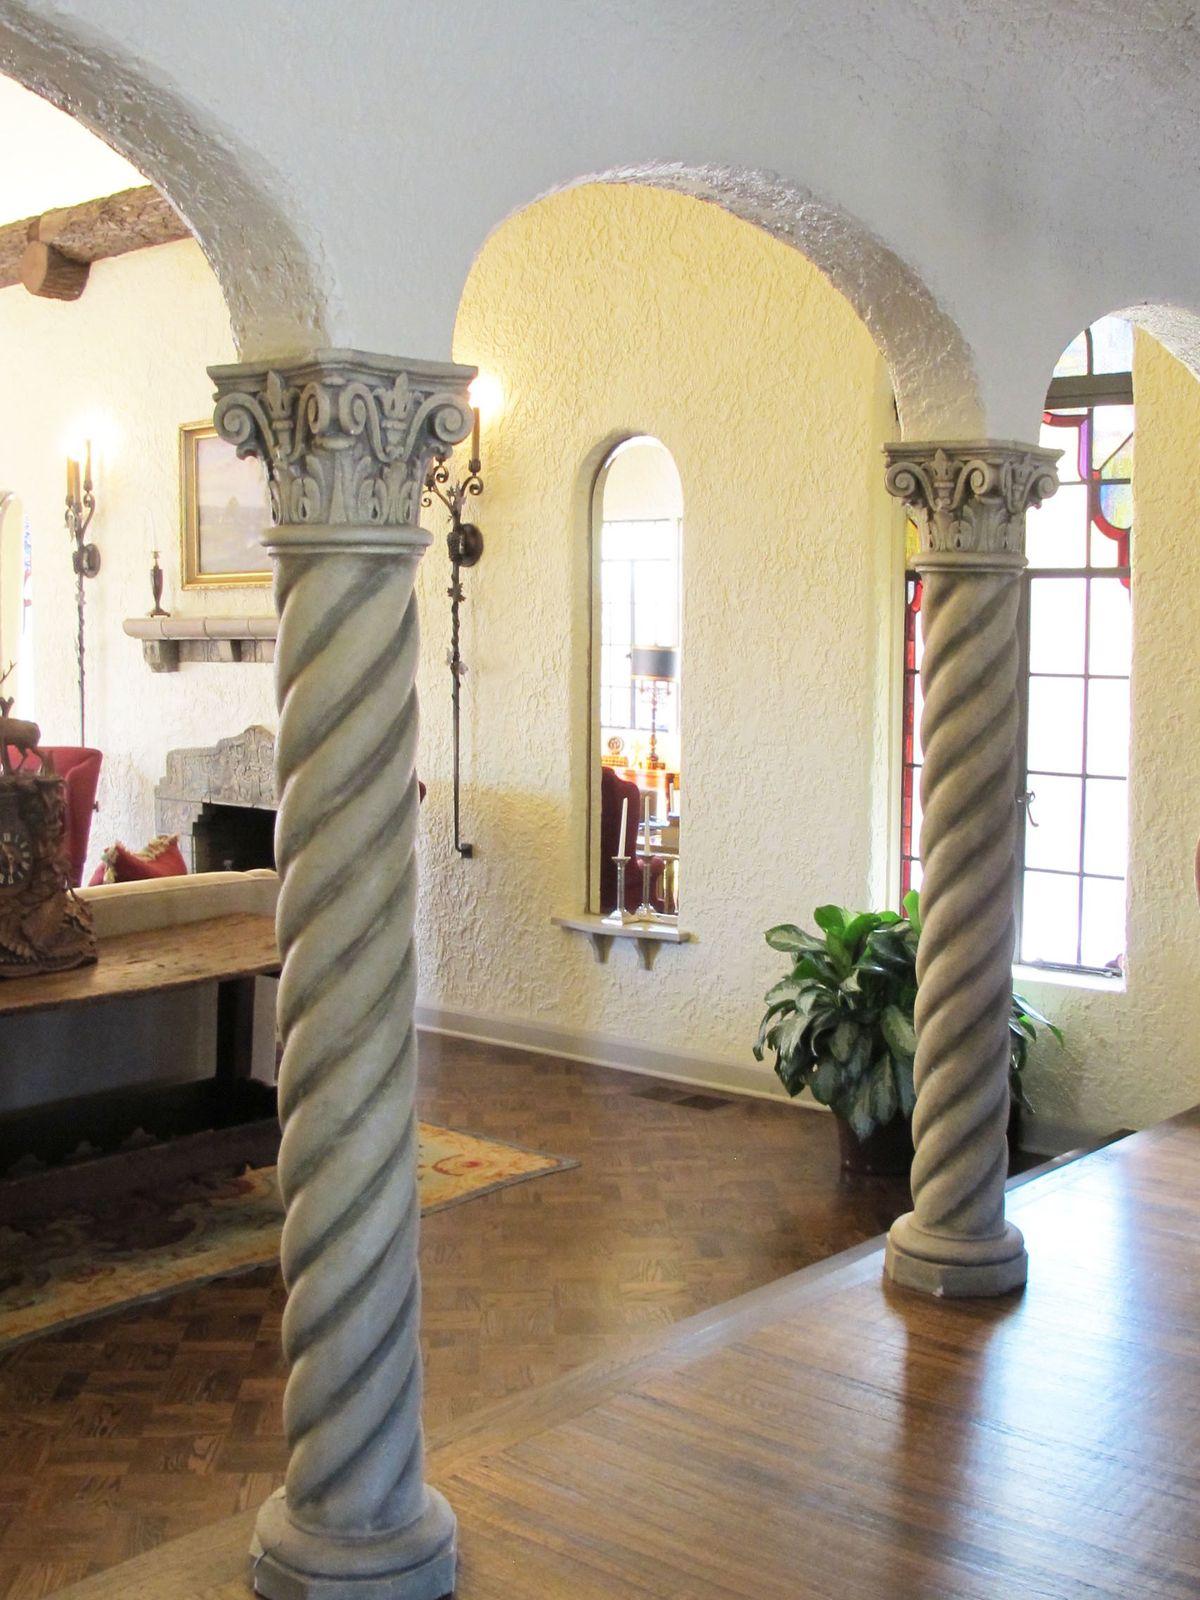 Historic Hutsell Mediterranean Home Photo Video Shoot Location 56.jpg